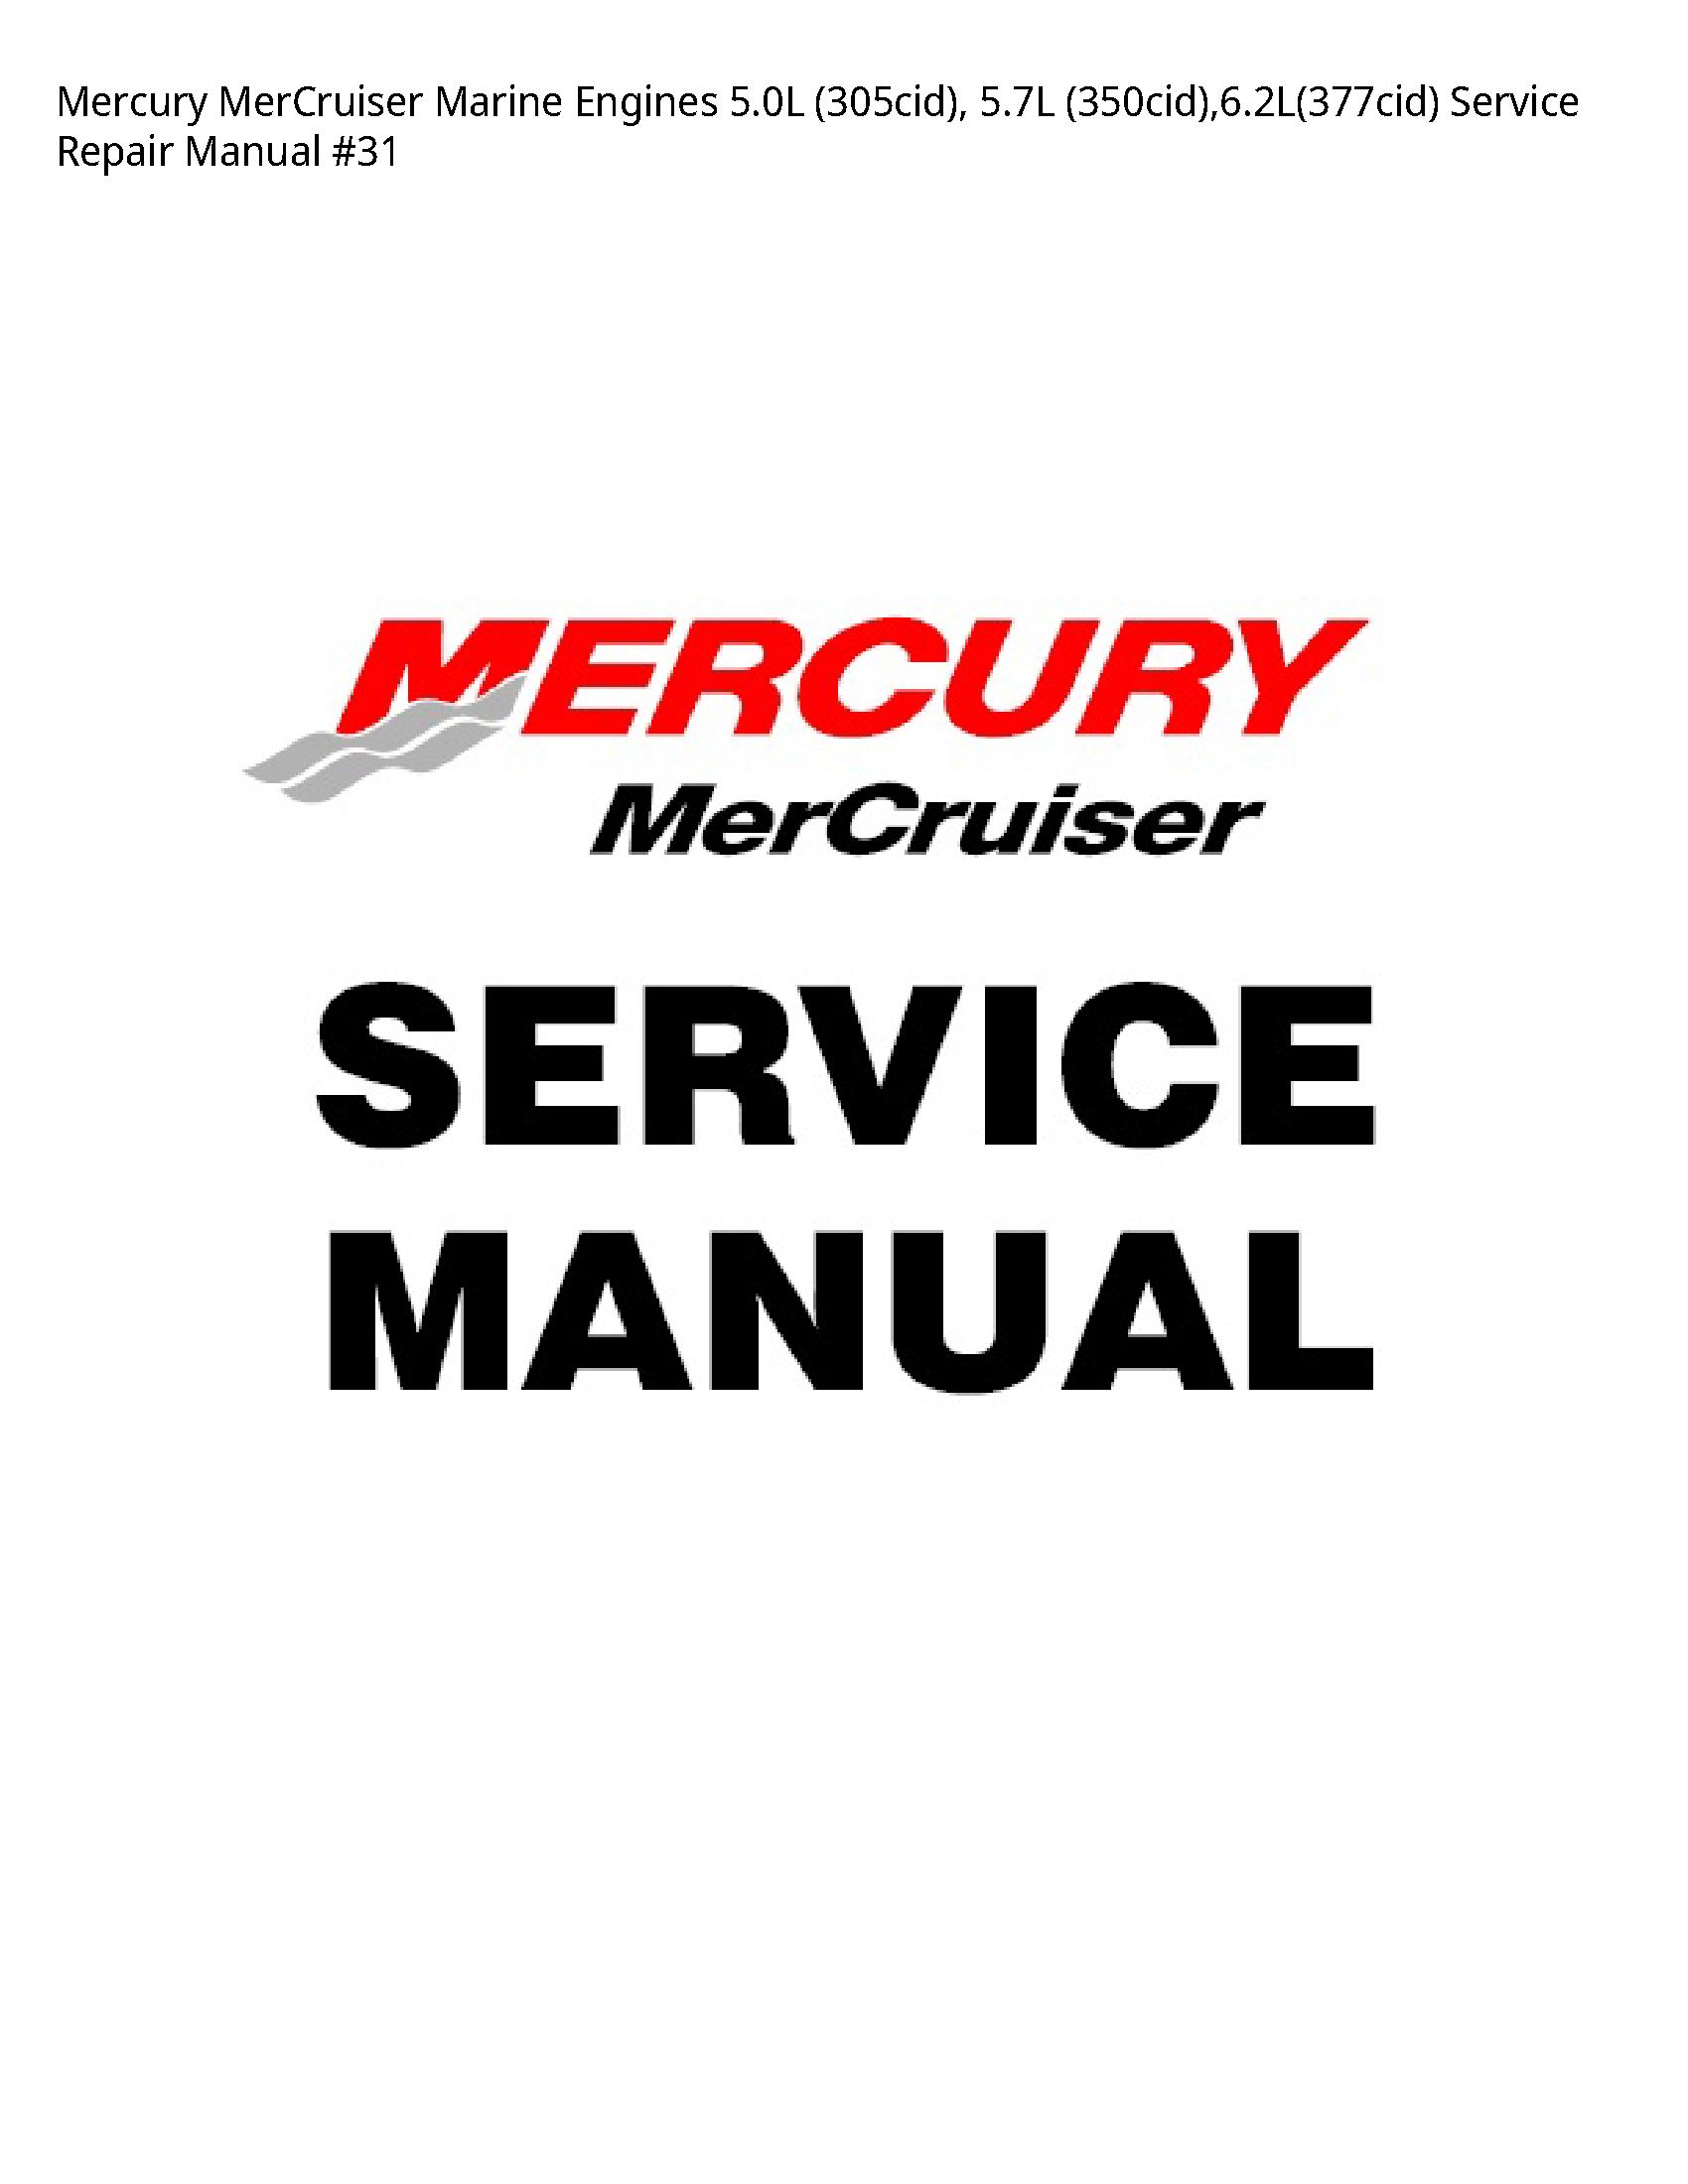 Mercury 5.0L MerCruiser Marine Engines manual